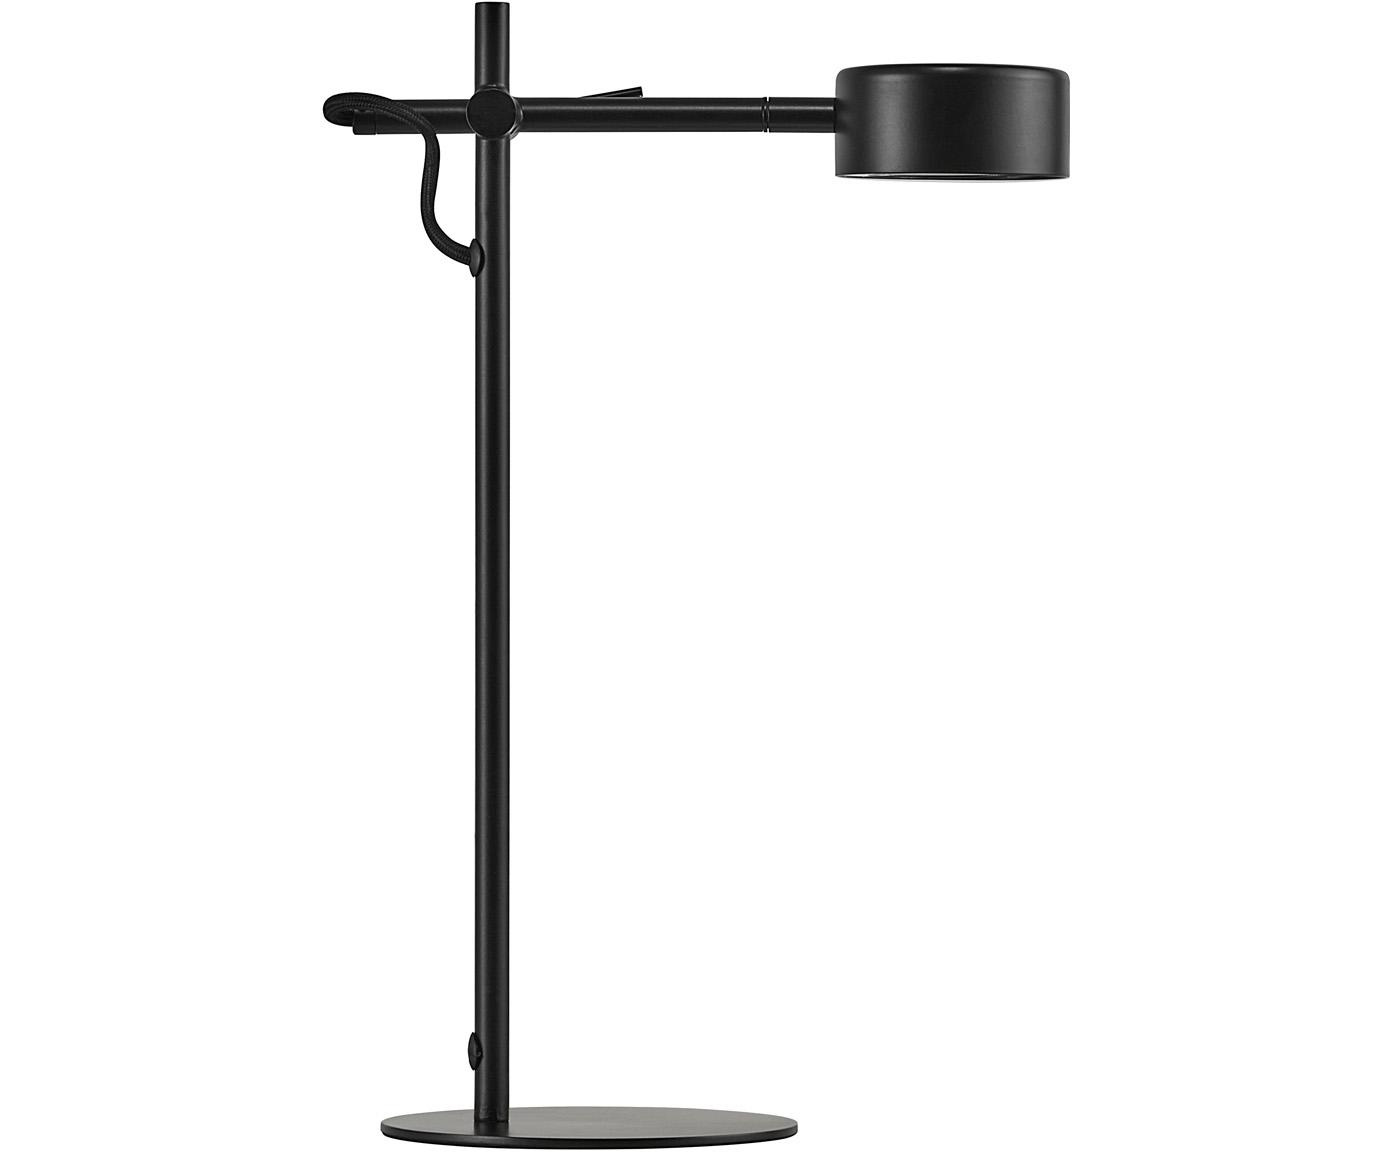 LED tafellamp Clyde, Lamp: gecoat metaal, Zwart, 15 x 41 cm